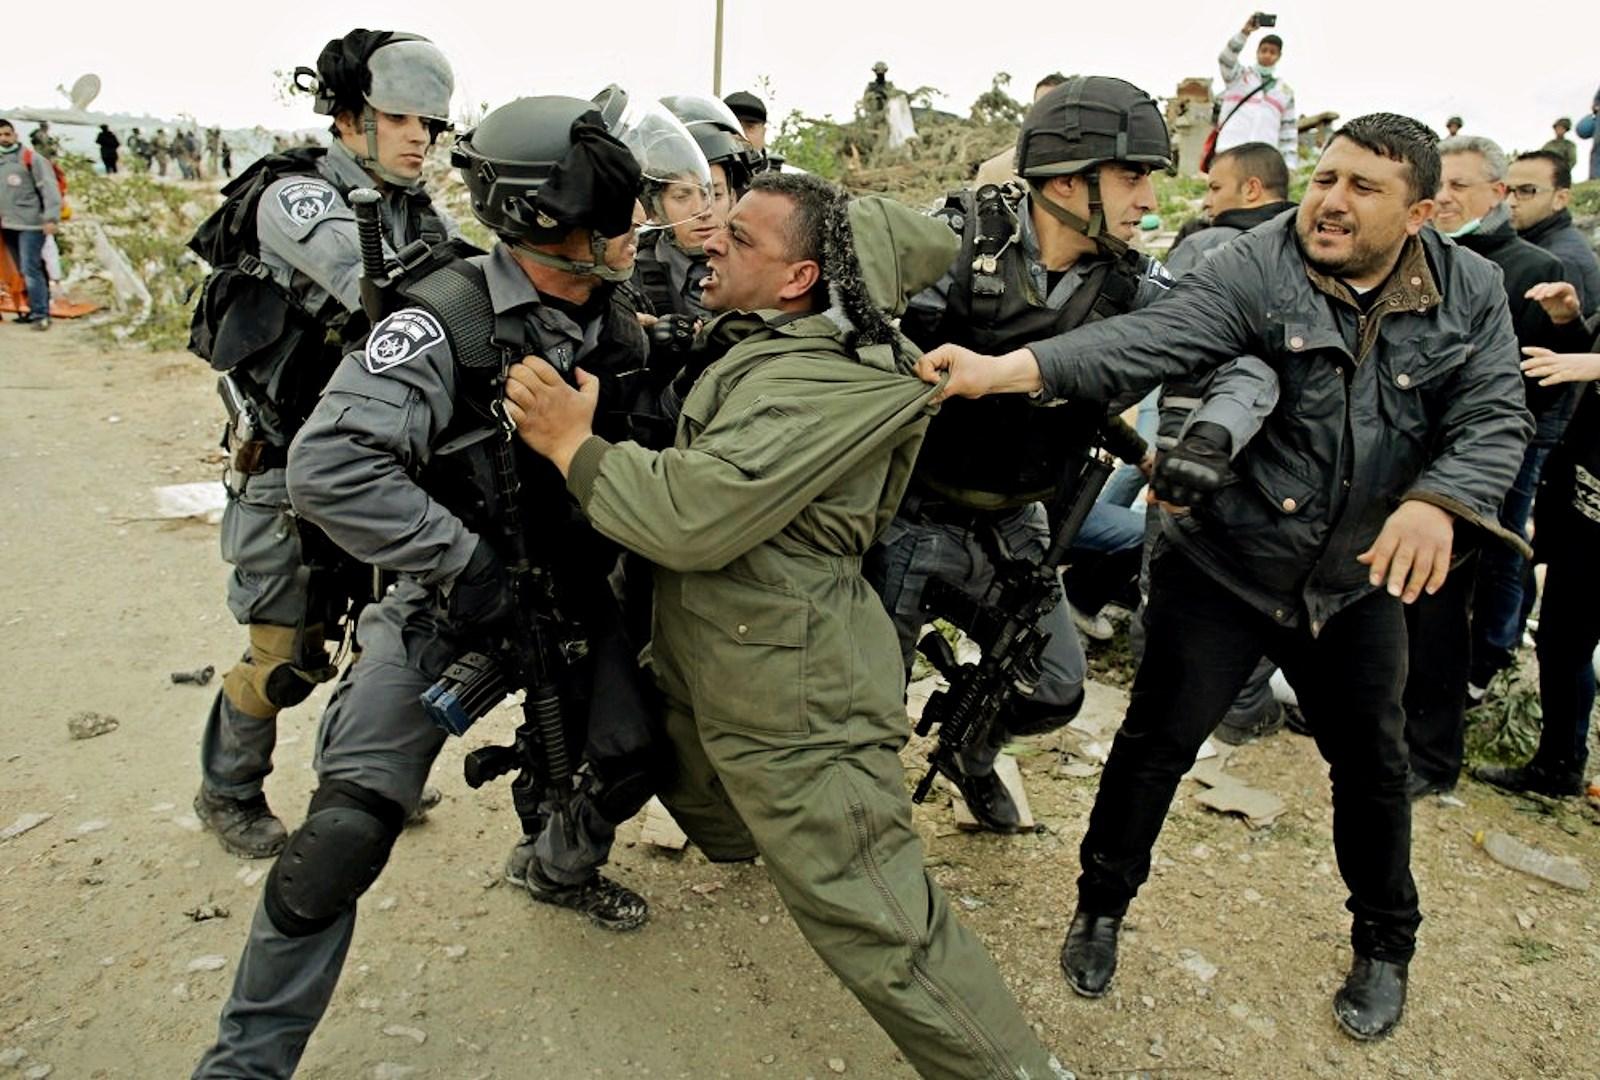 00 israeli pigs rough up palestinians. 27.02.15